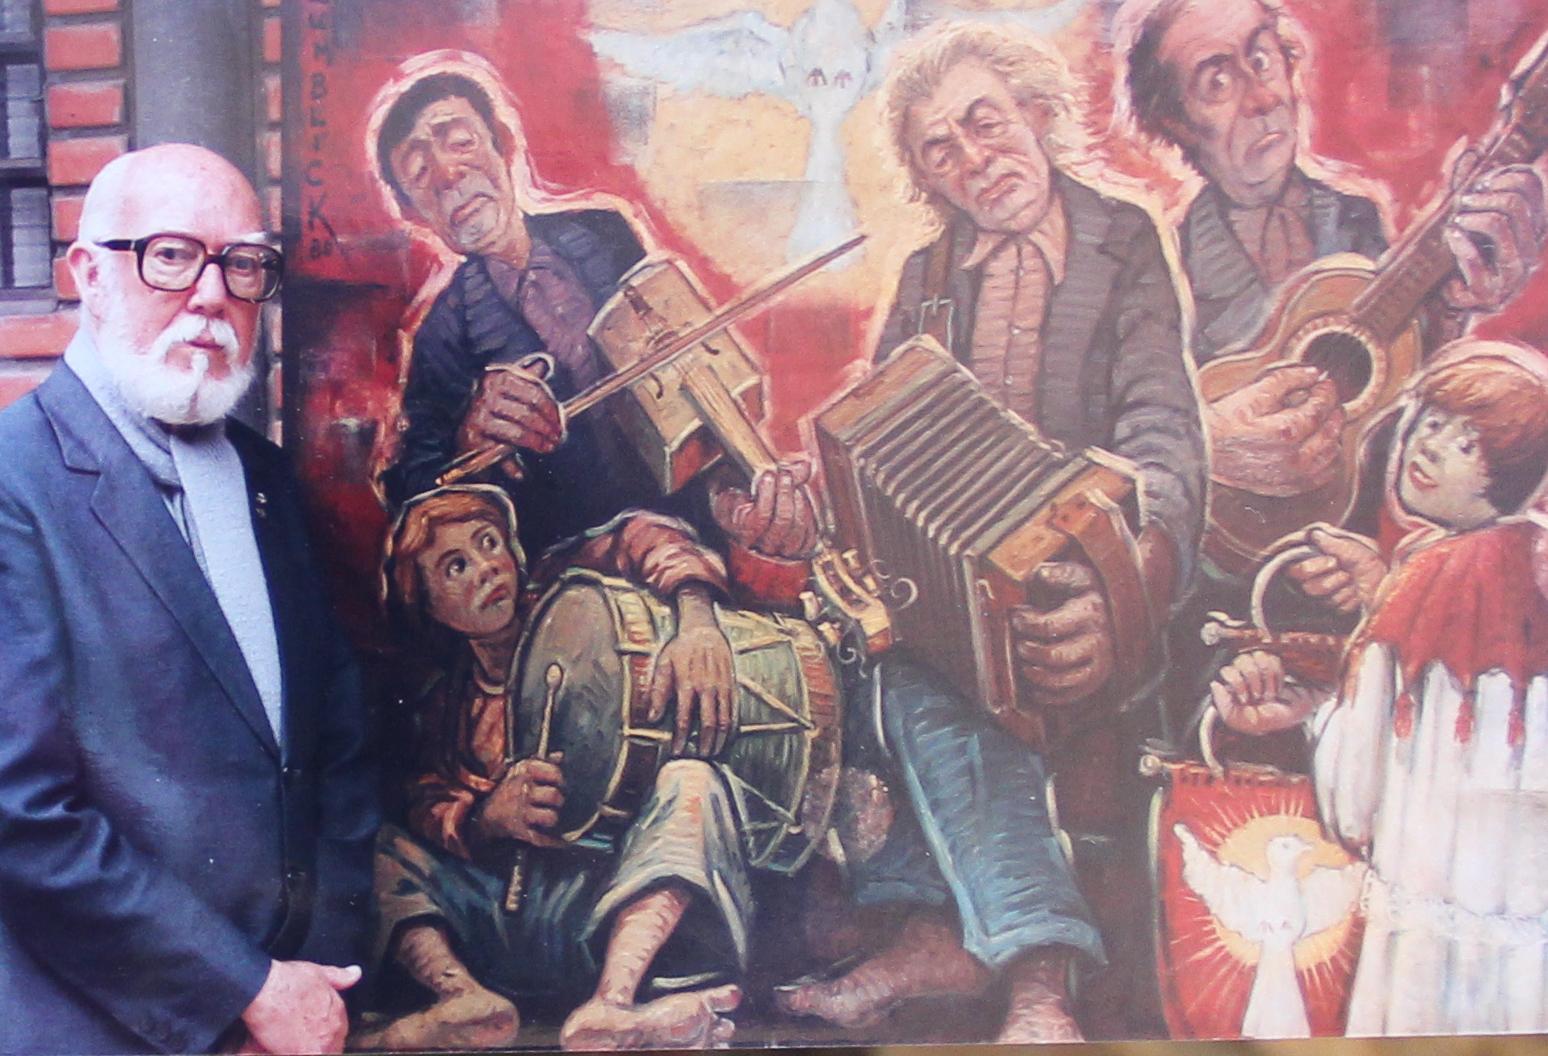 Unesc homenageia artista plástico Willy Zumblick